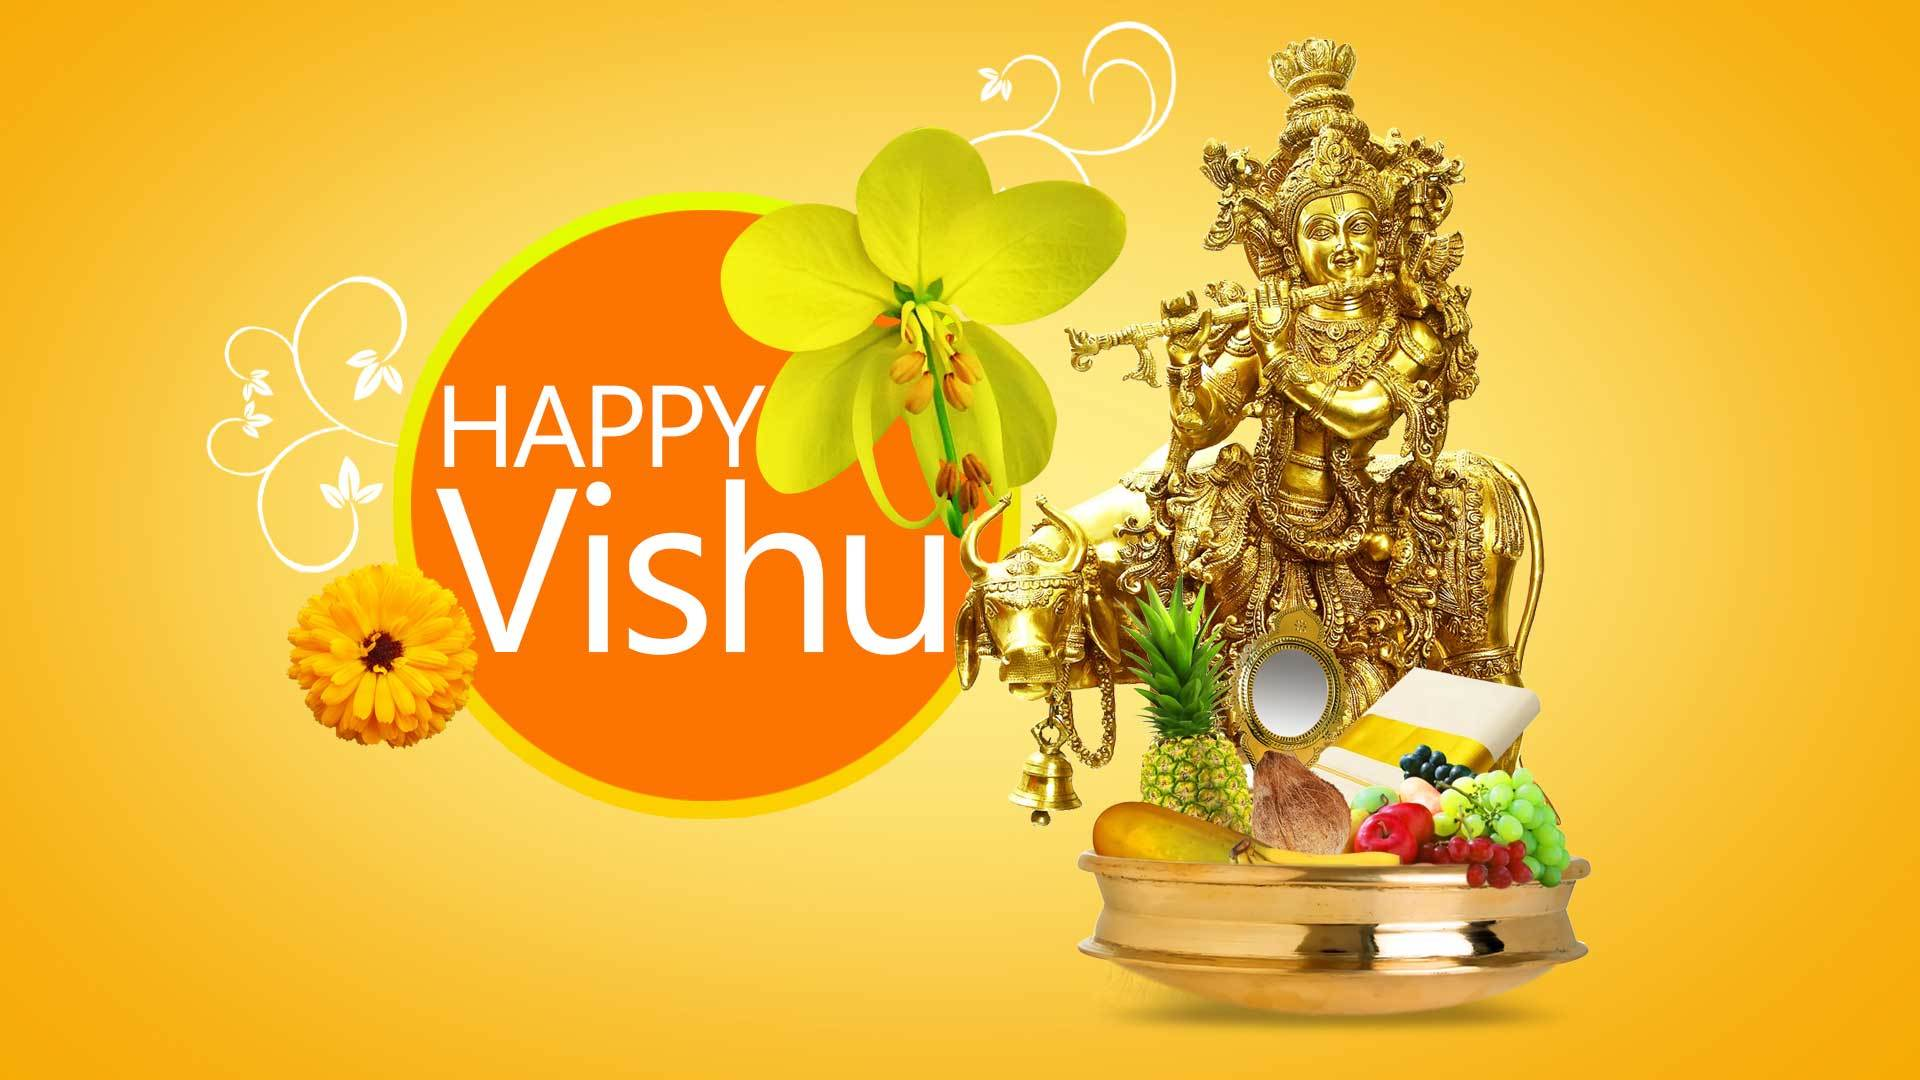 Vishu-Pujabooking